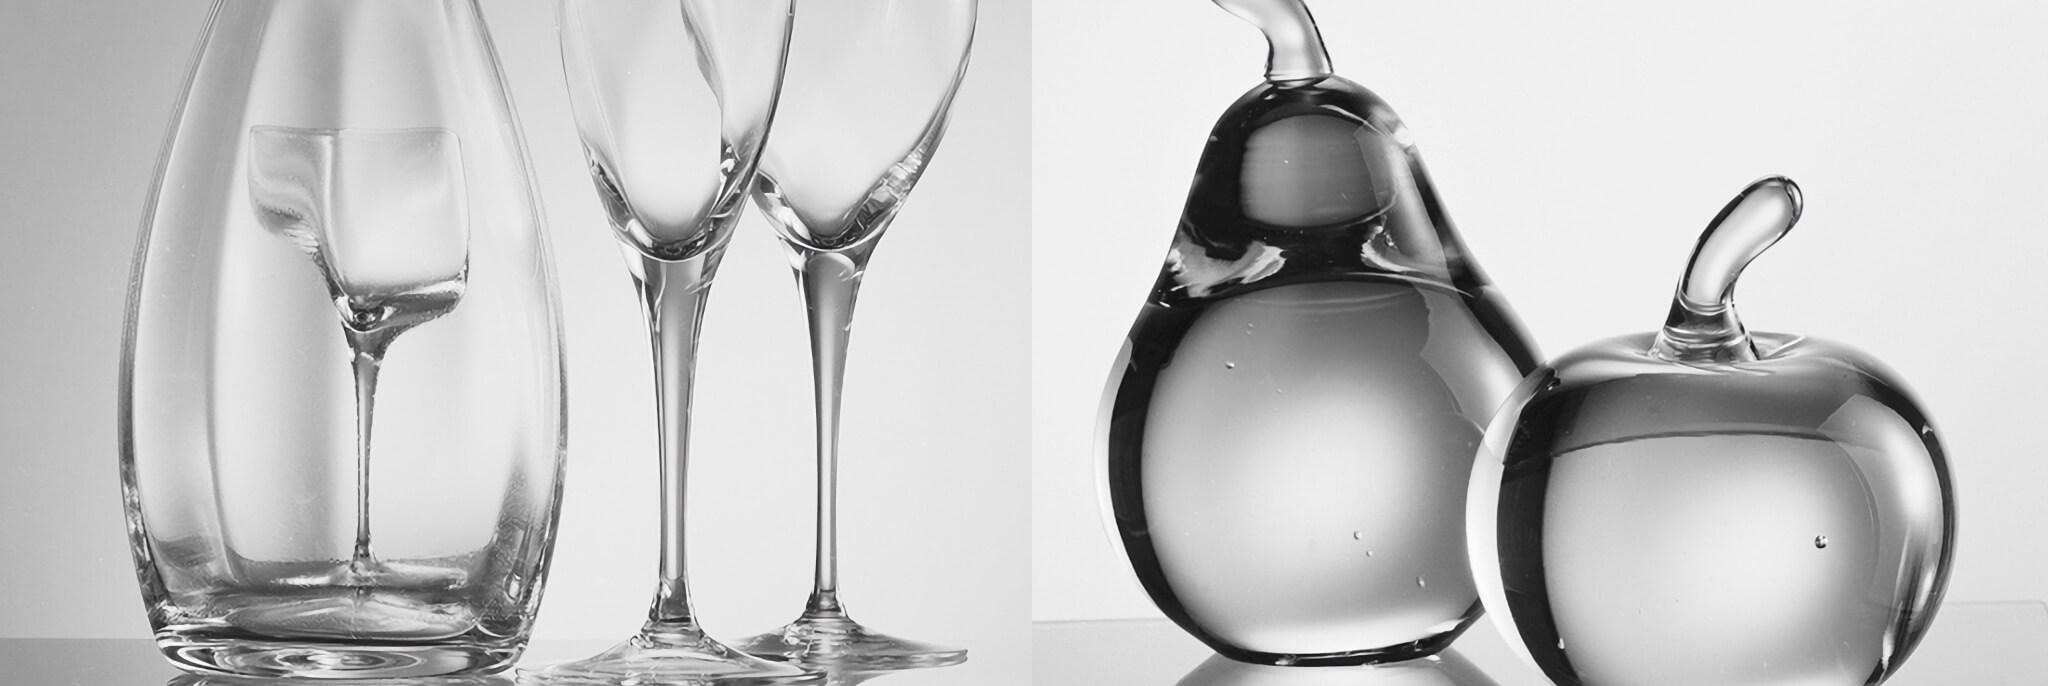 """Fotografie skla je fotografie turistická."" Rozhovor se Stanislavem Pokorným o focení skla"